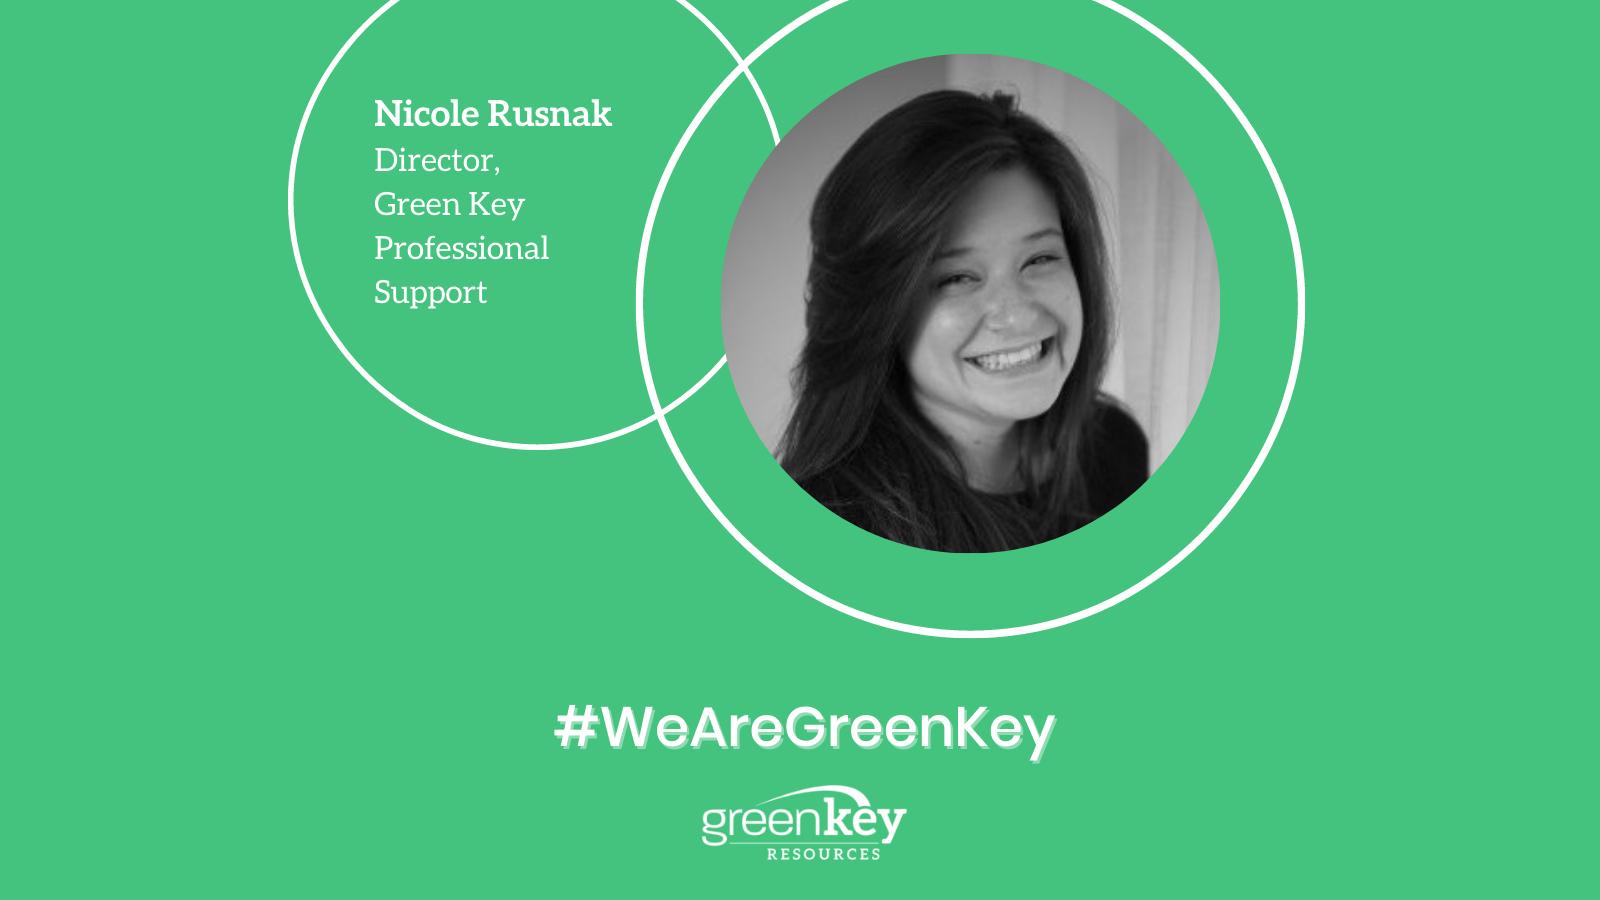 Nicole Rusnak - Director - Green Key Professional Support